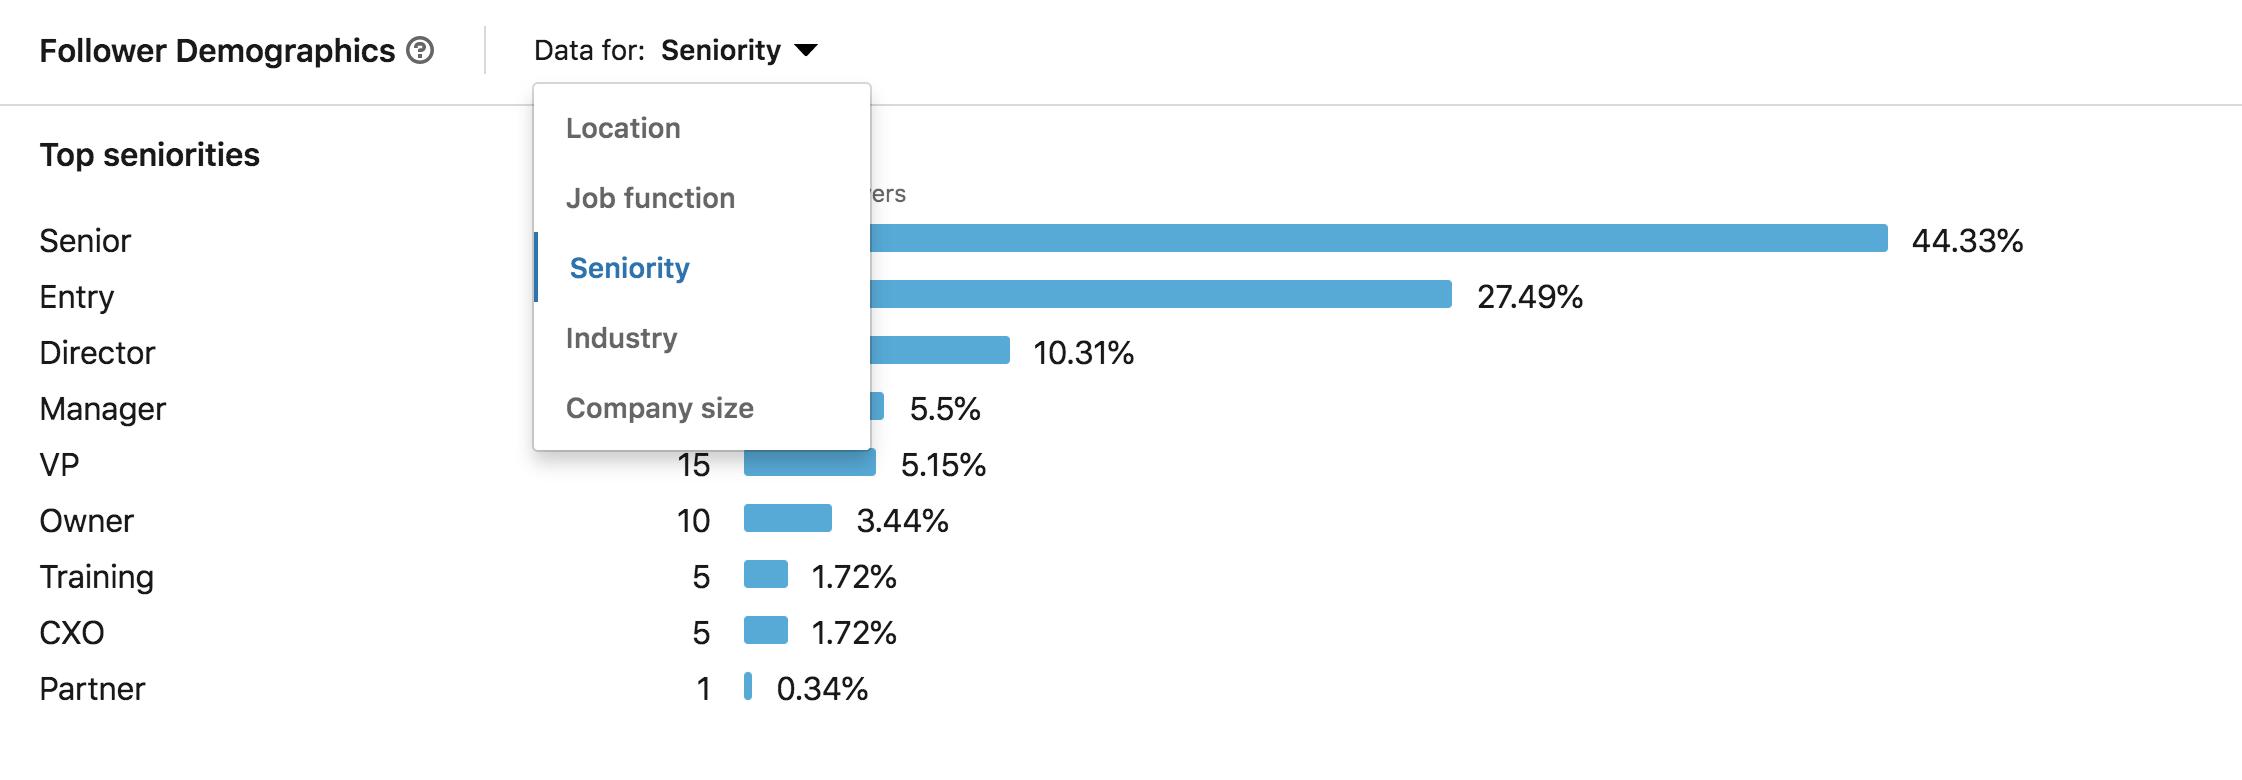 follower demographics linkedin insights